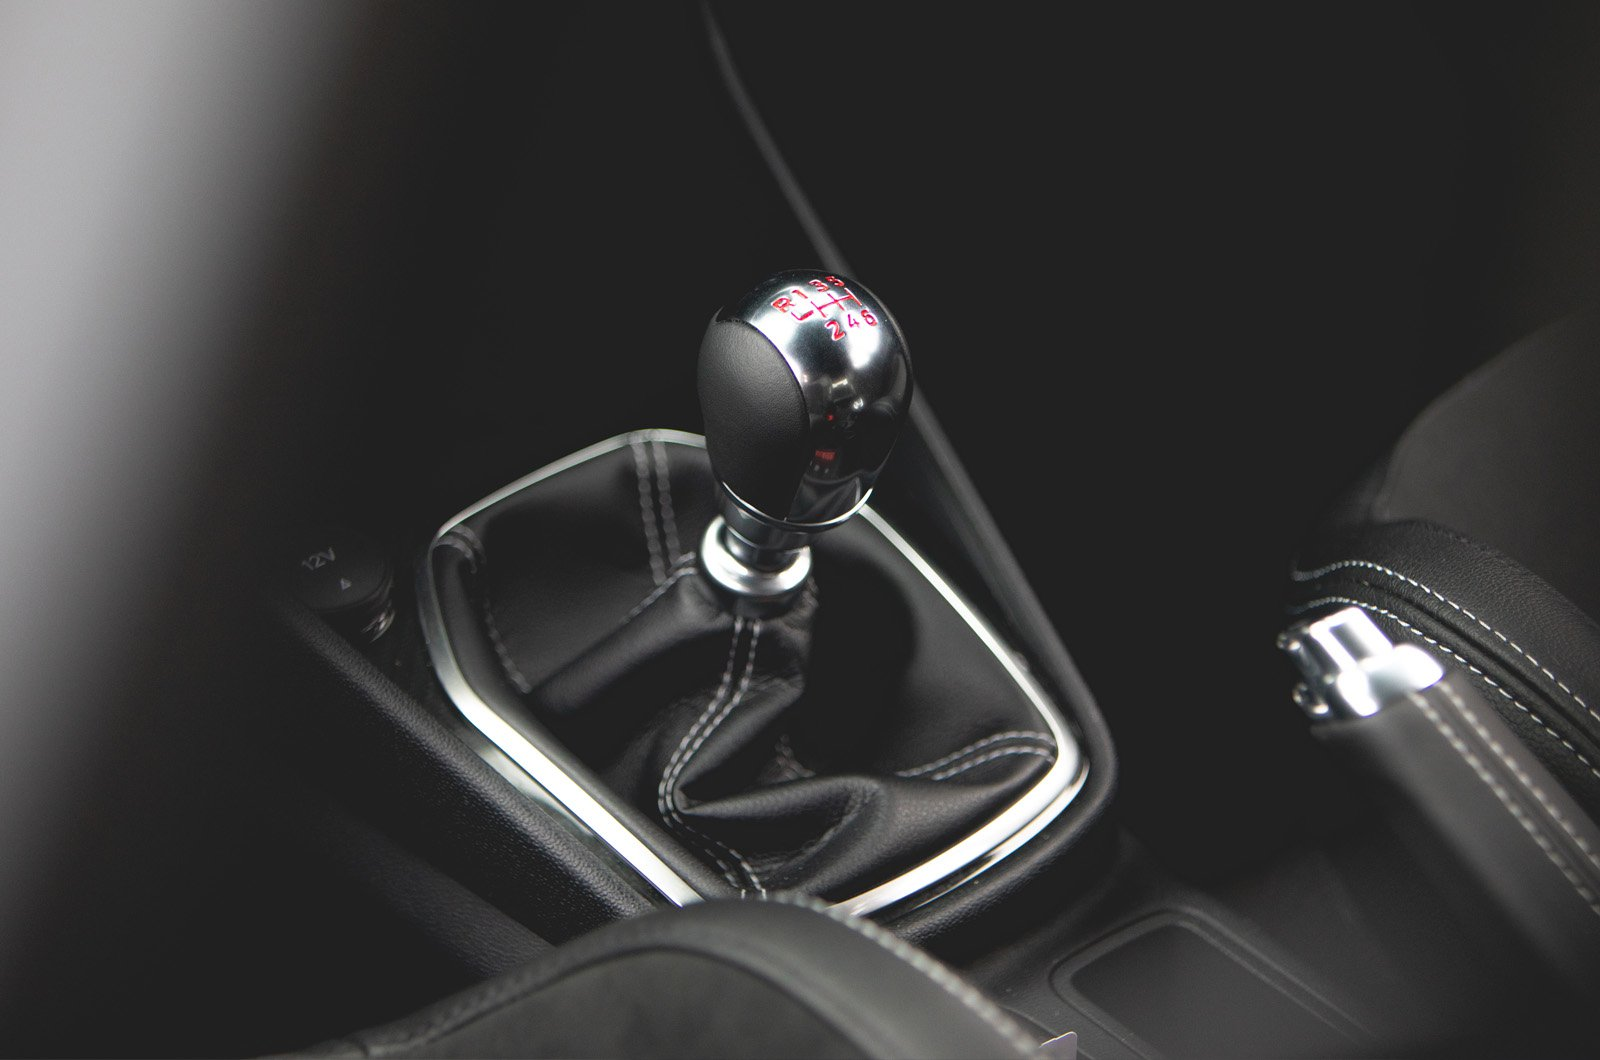 Fiesta ST gear lever long-term